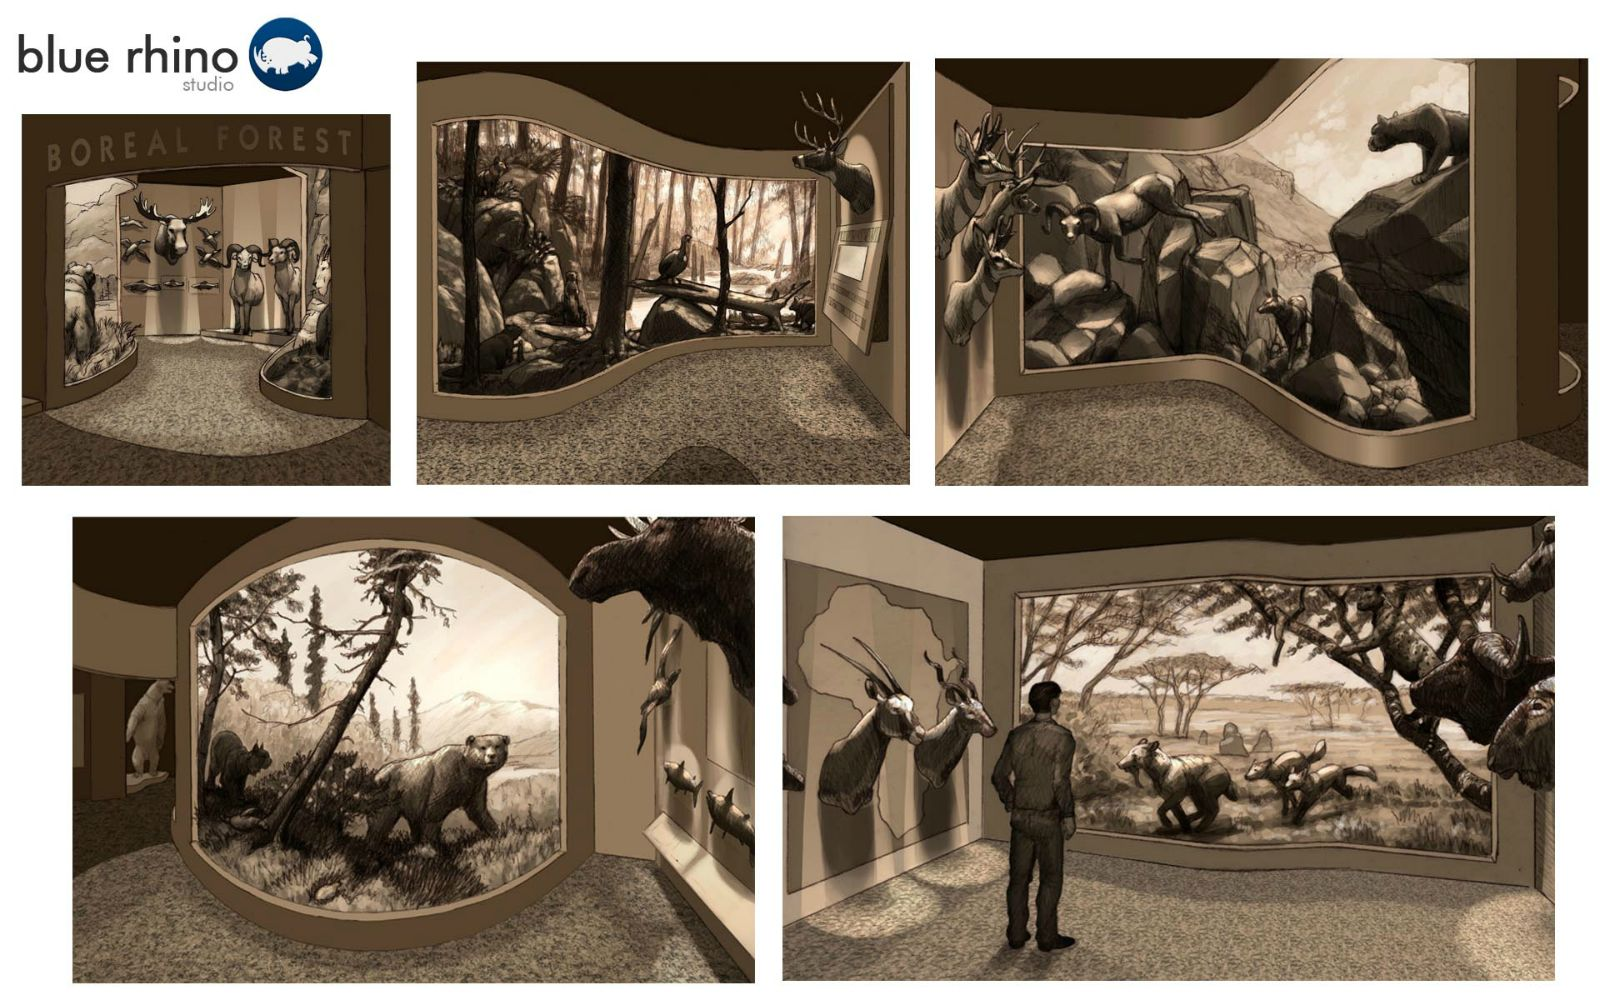 Traditional wildlife diorama design